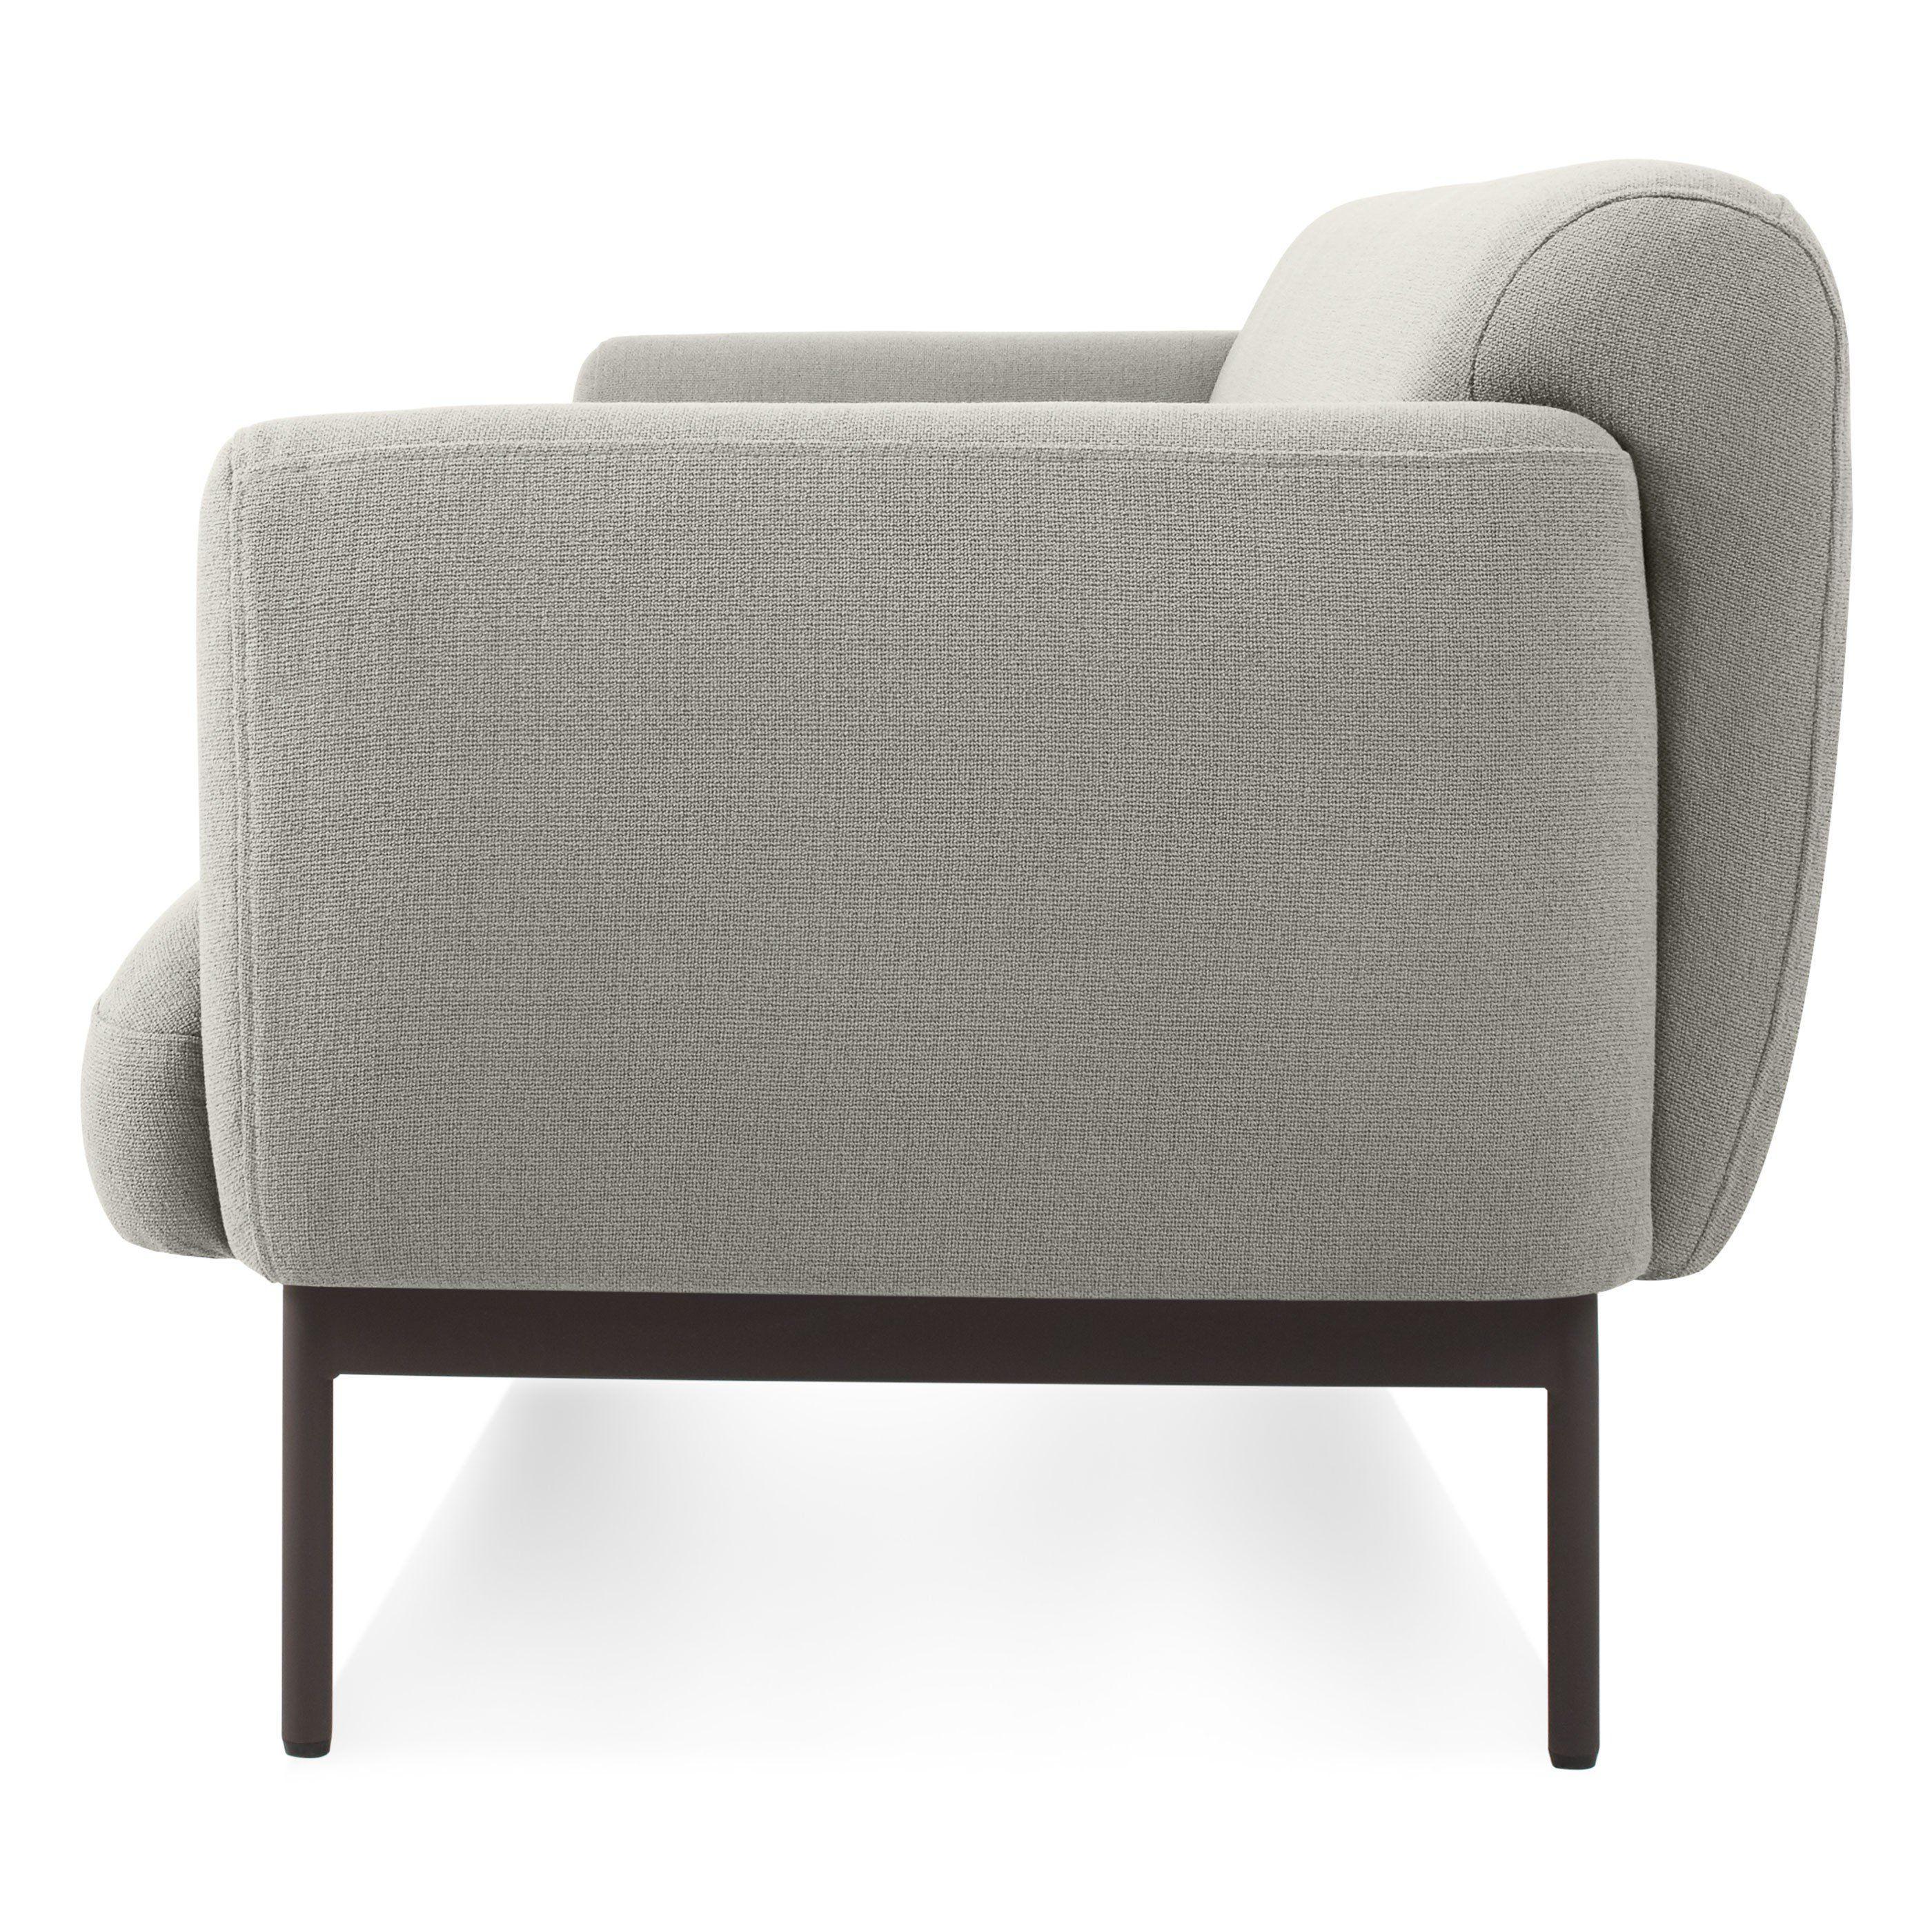 Sofas Puff Drdp Puff Puff Studio sofa In 2018 Clancy Pinterest sofa Modern